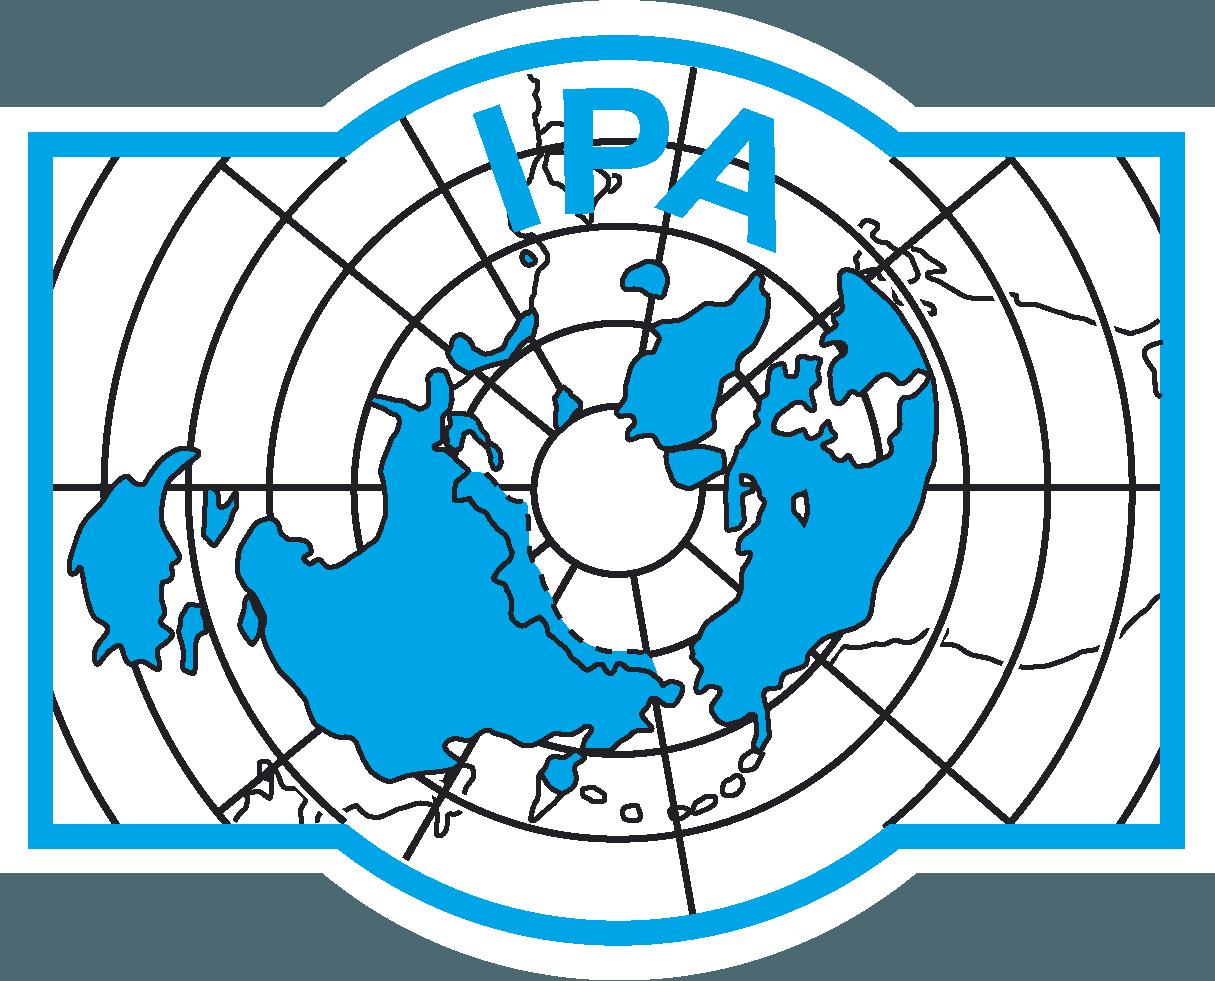 International Permafrost Association